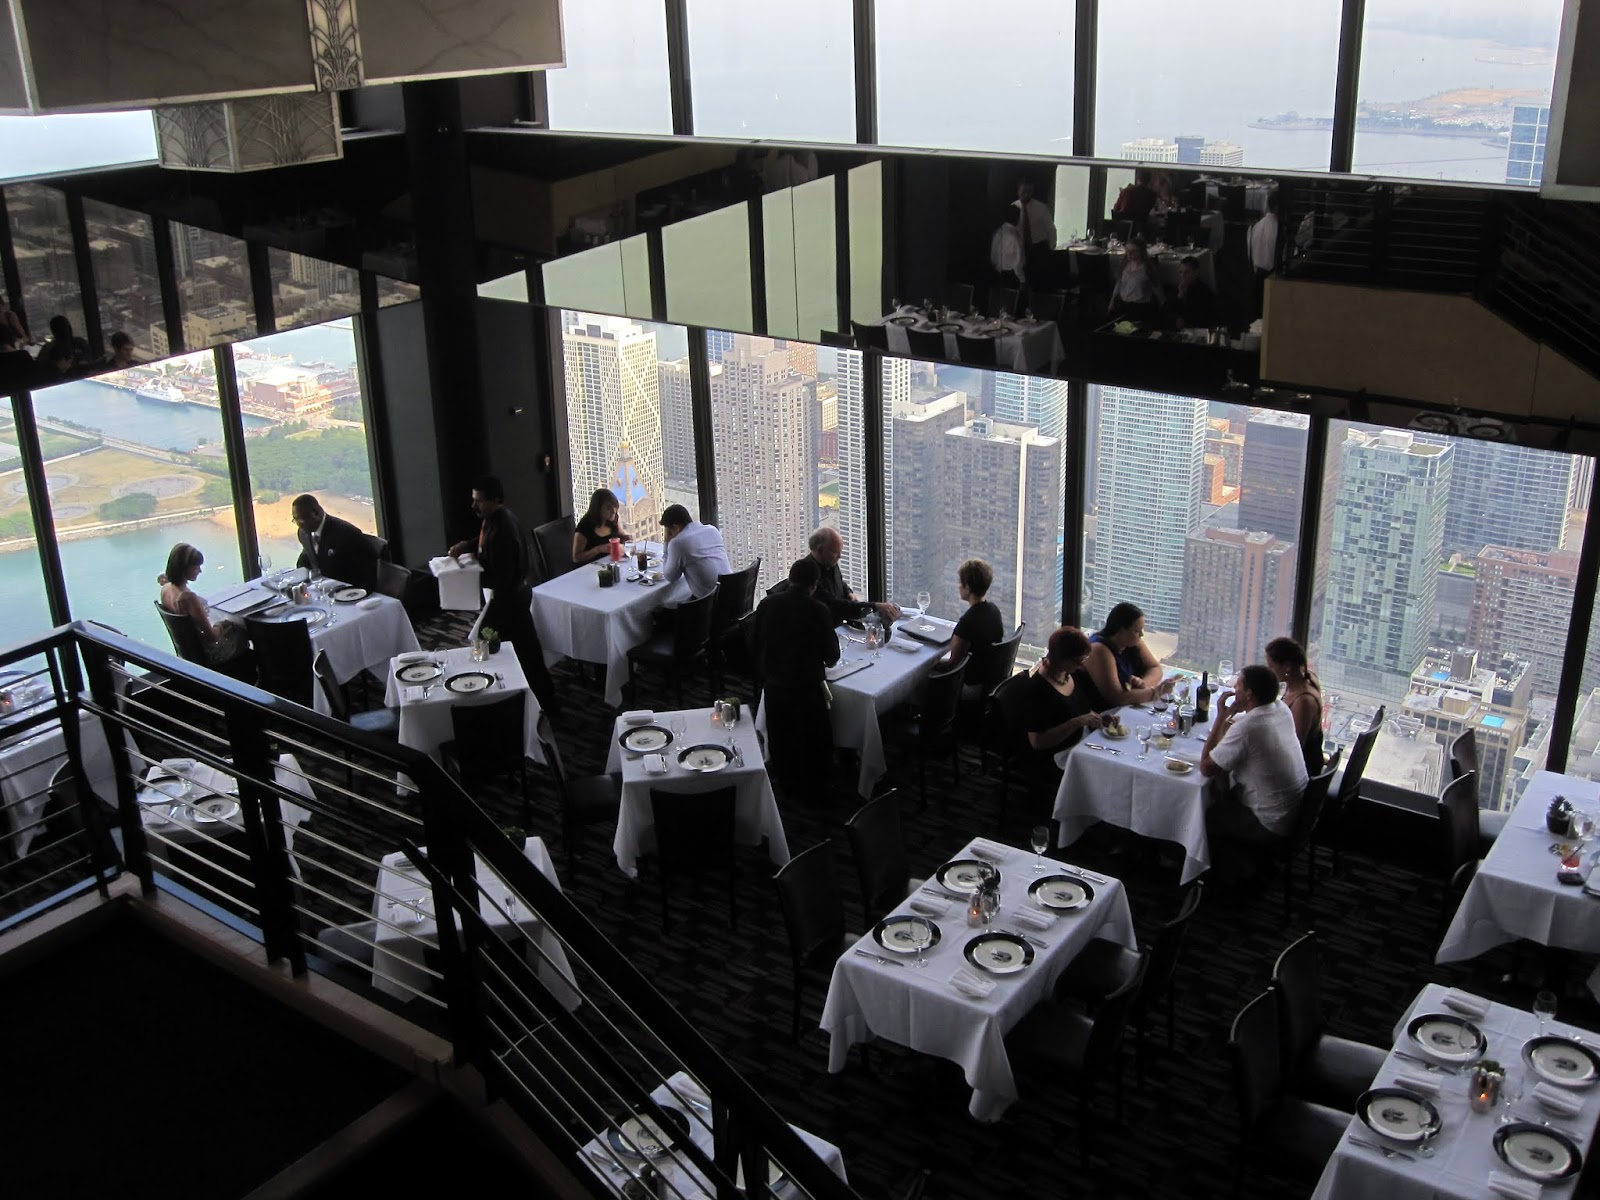 SeattleFlyerGuys All Purpose Travel Blog Short Hours in Chicago